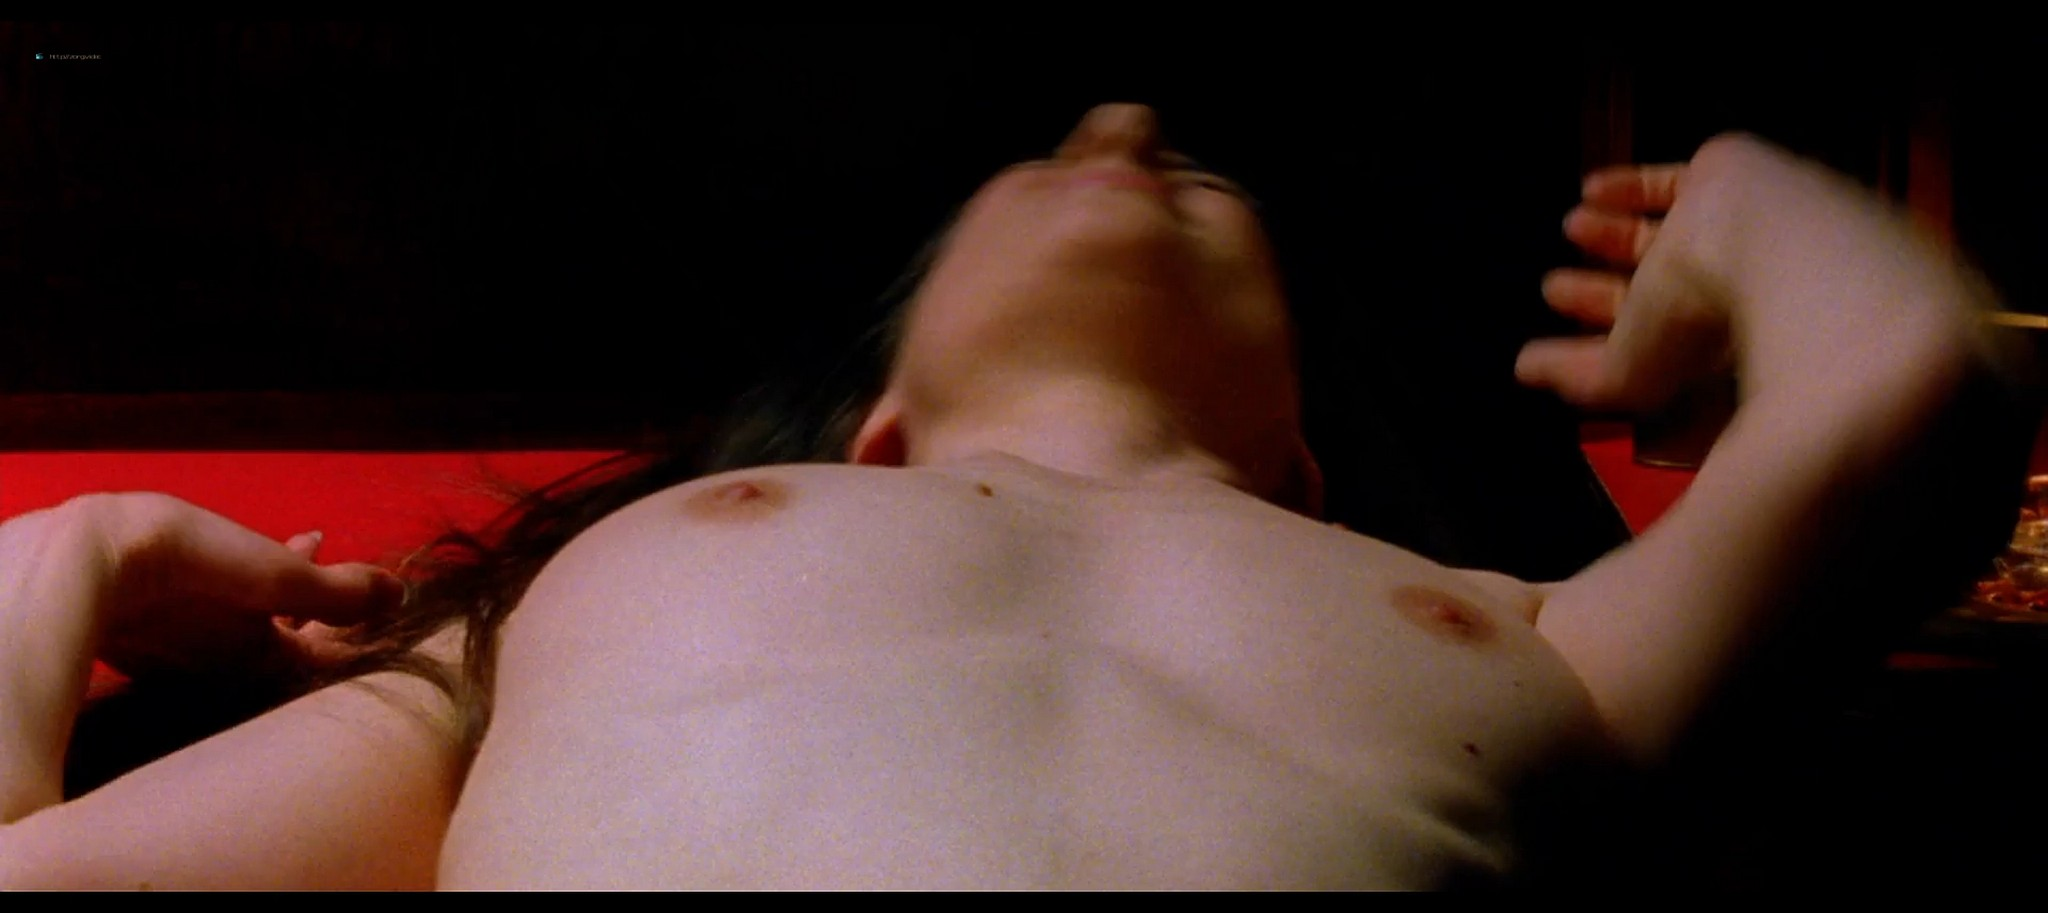 Anna DAnnunzio nude Sylvia Camarda nude too The Strange Color of Your Bodys Tears 2013 1080 BluRay 6